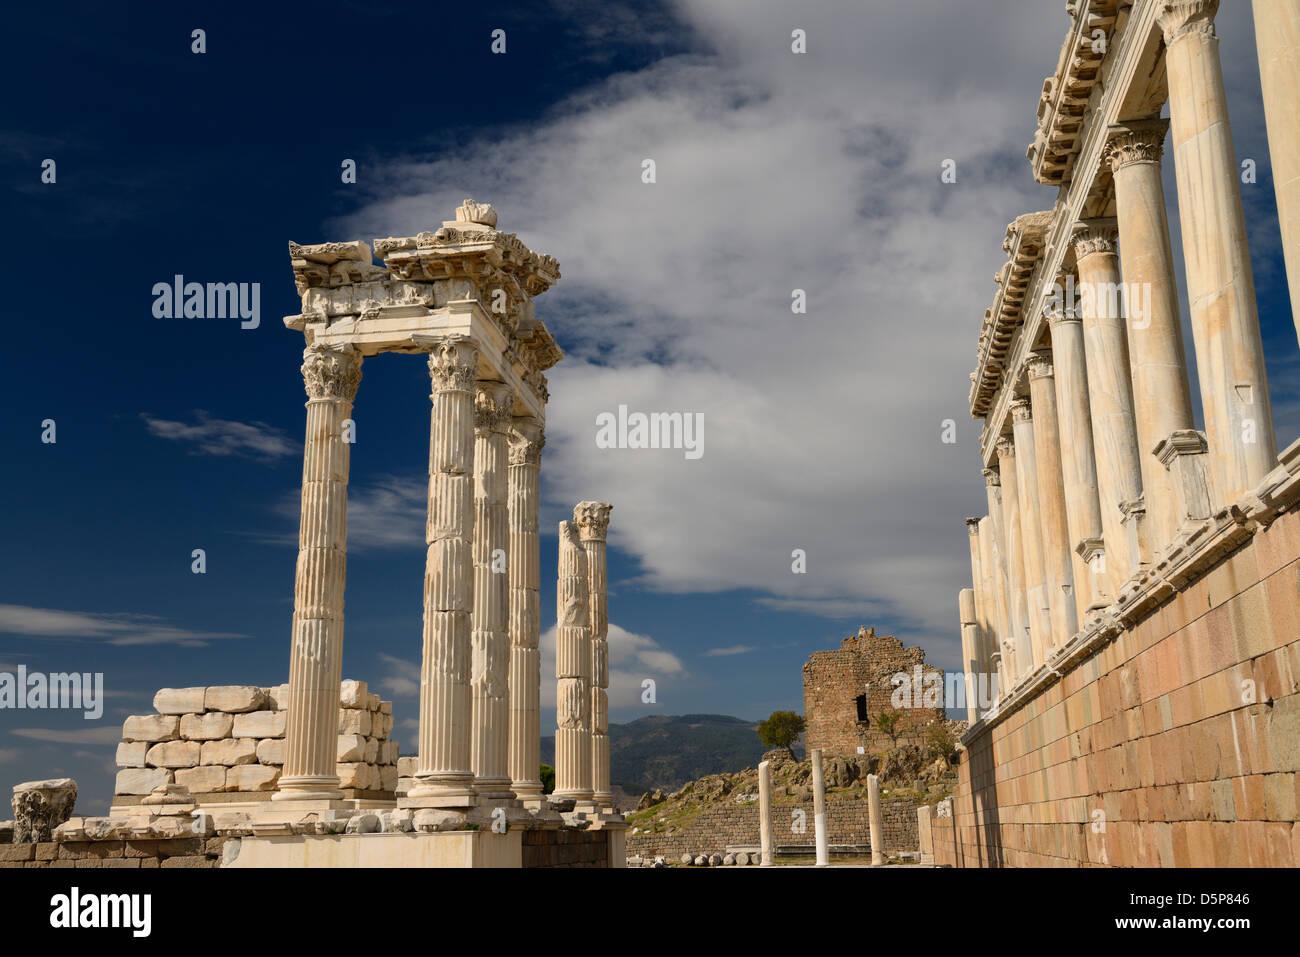 Restored Corinthian columns at ancient Pergamon archaeological site at Bergama Turkey - Stock Image